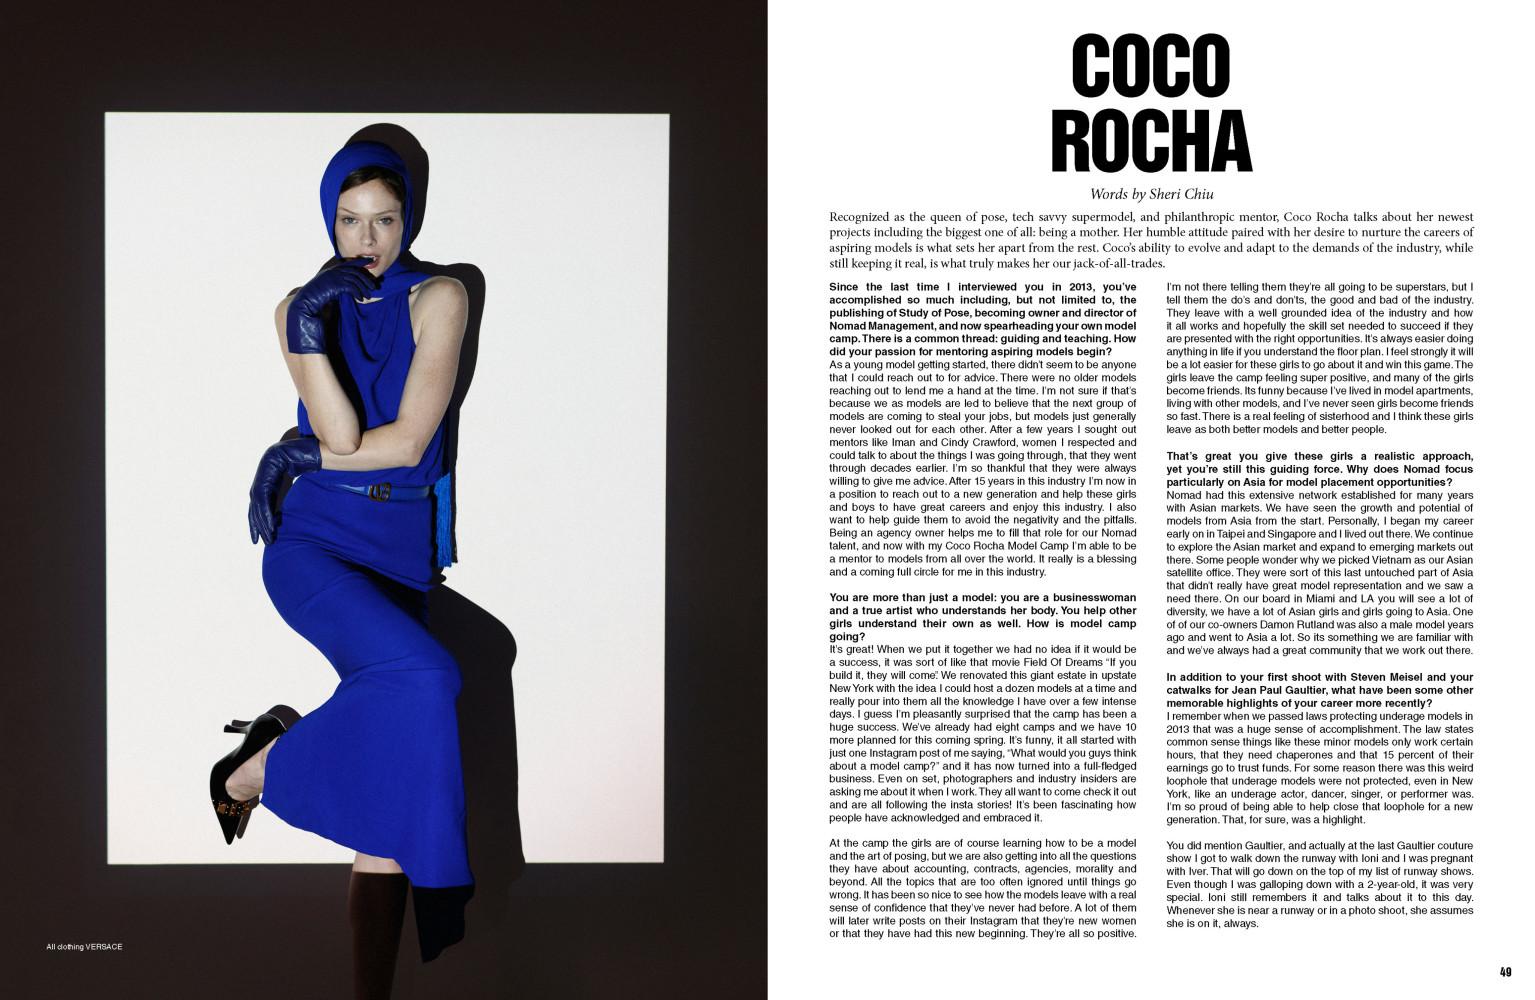 SPOTTED: DSCENE // COCO ROCHA